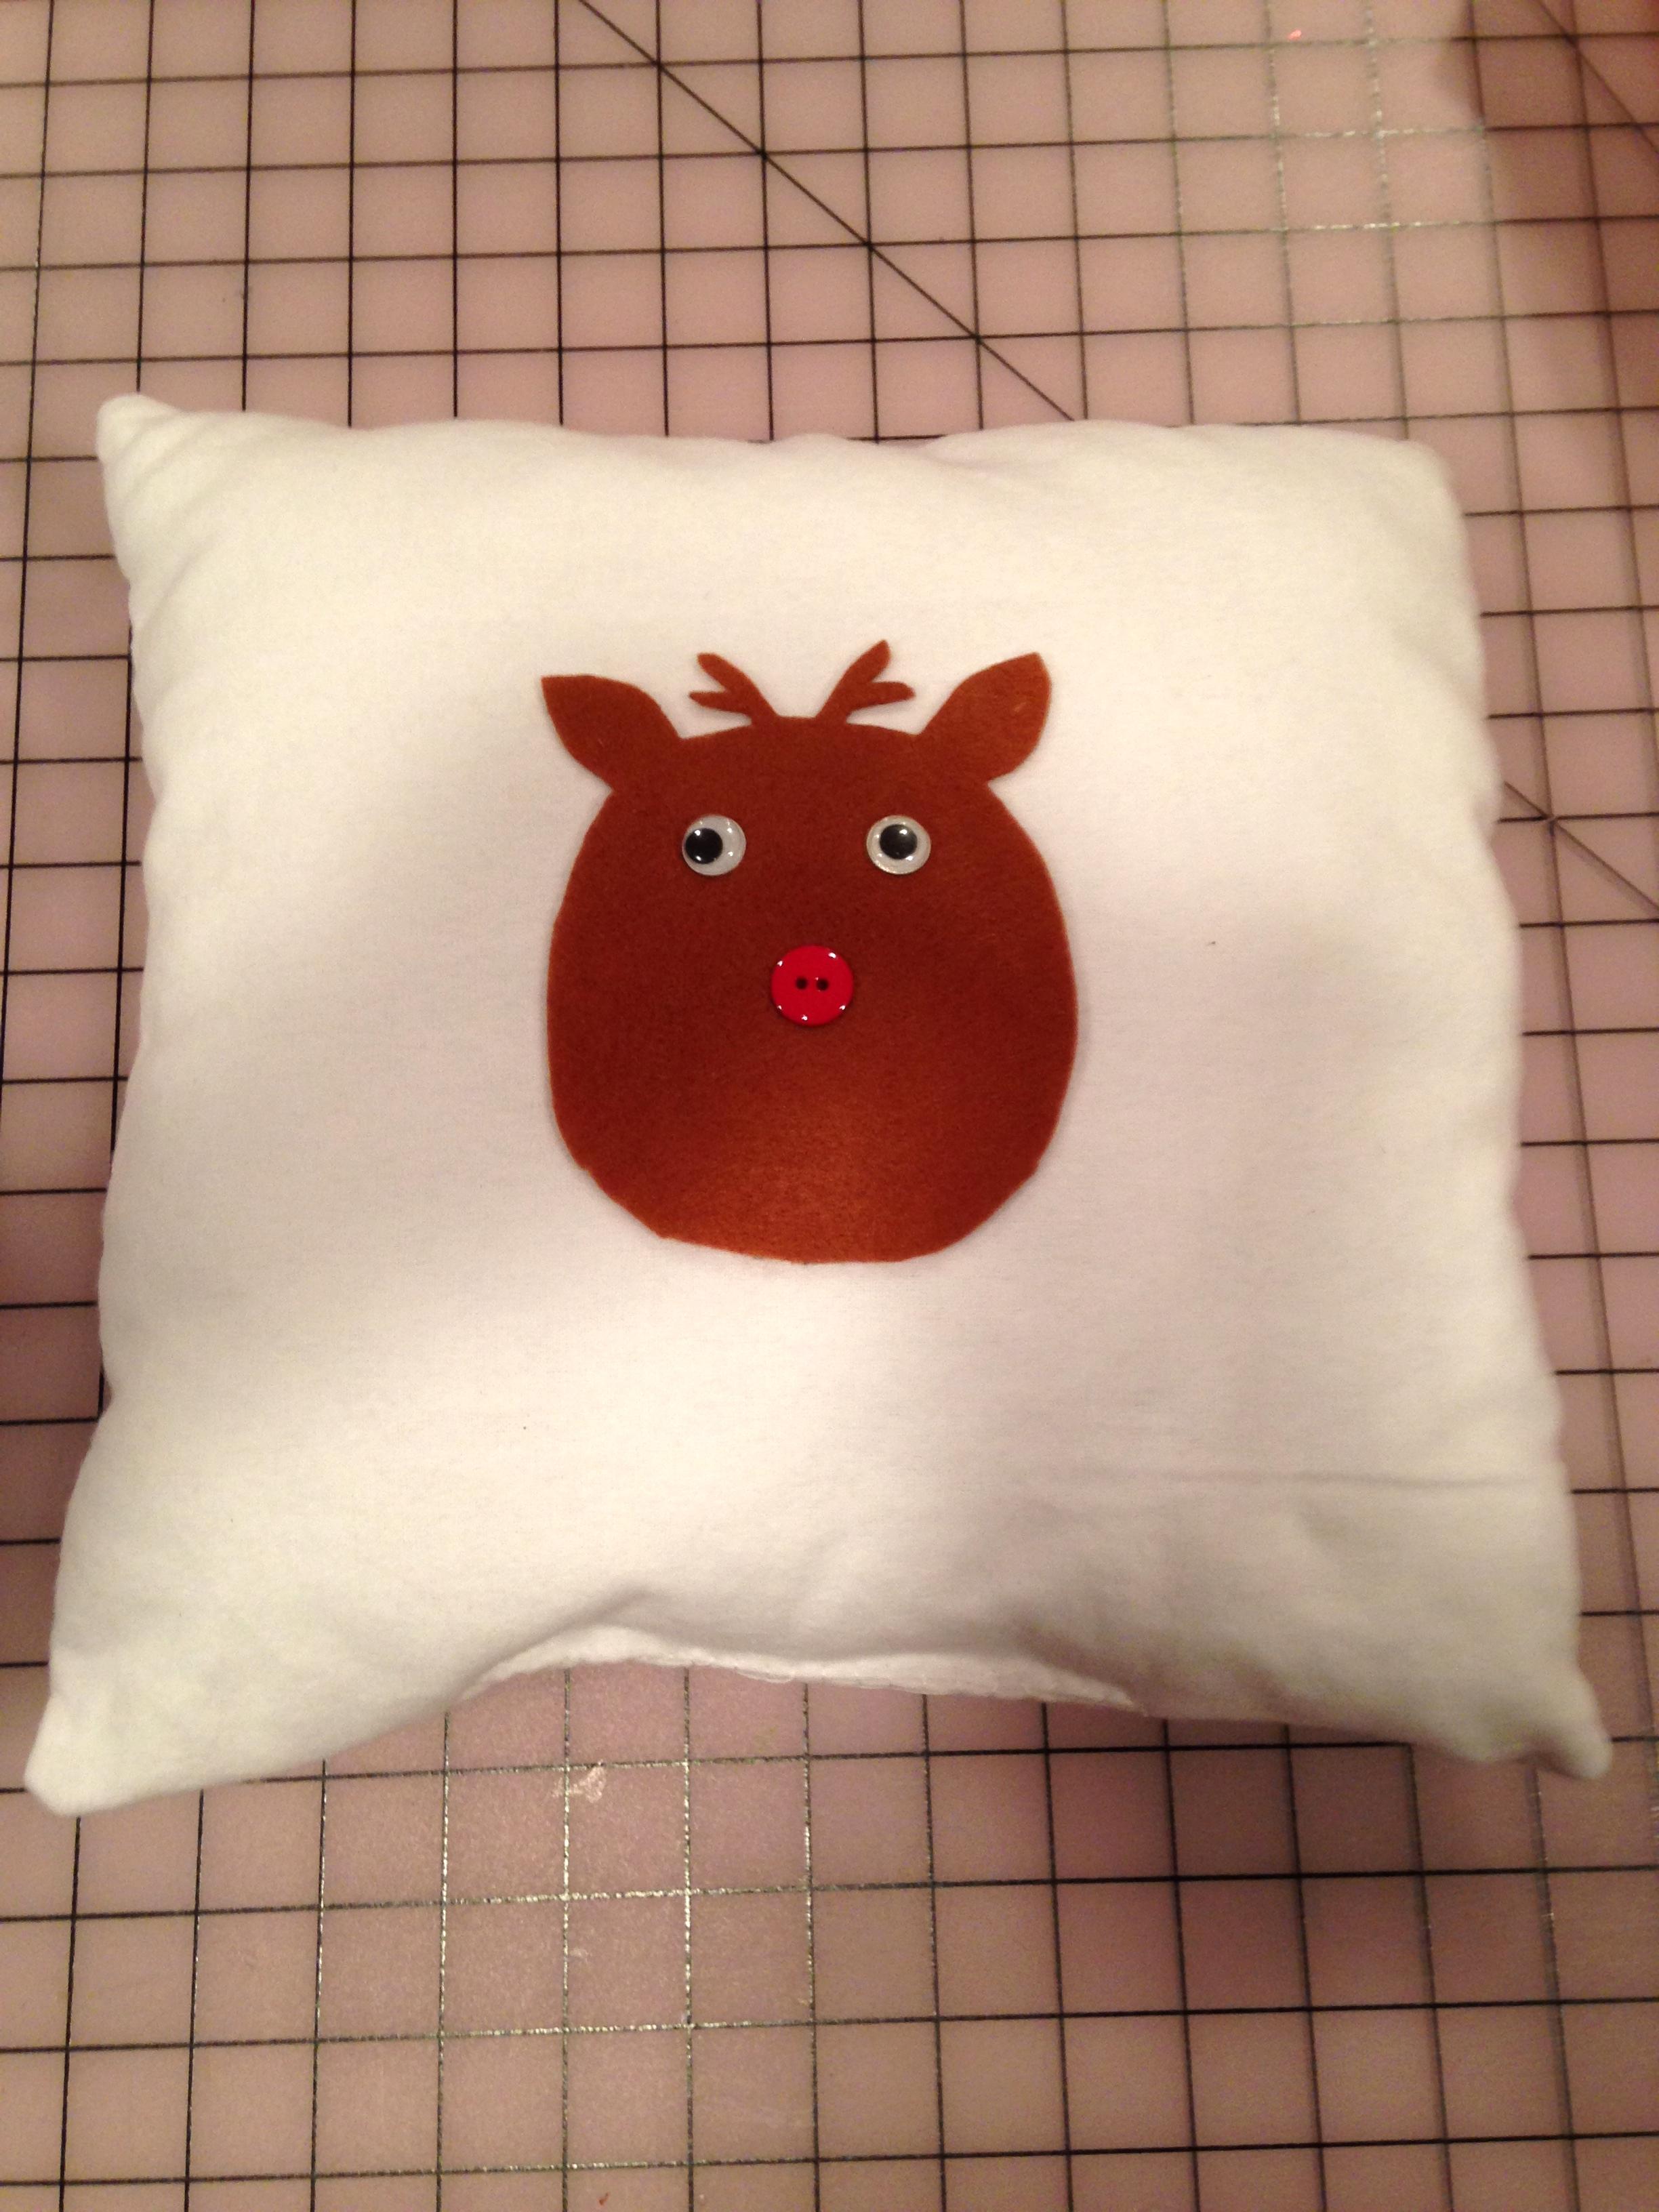 Look, it's Rudolph!